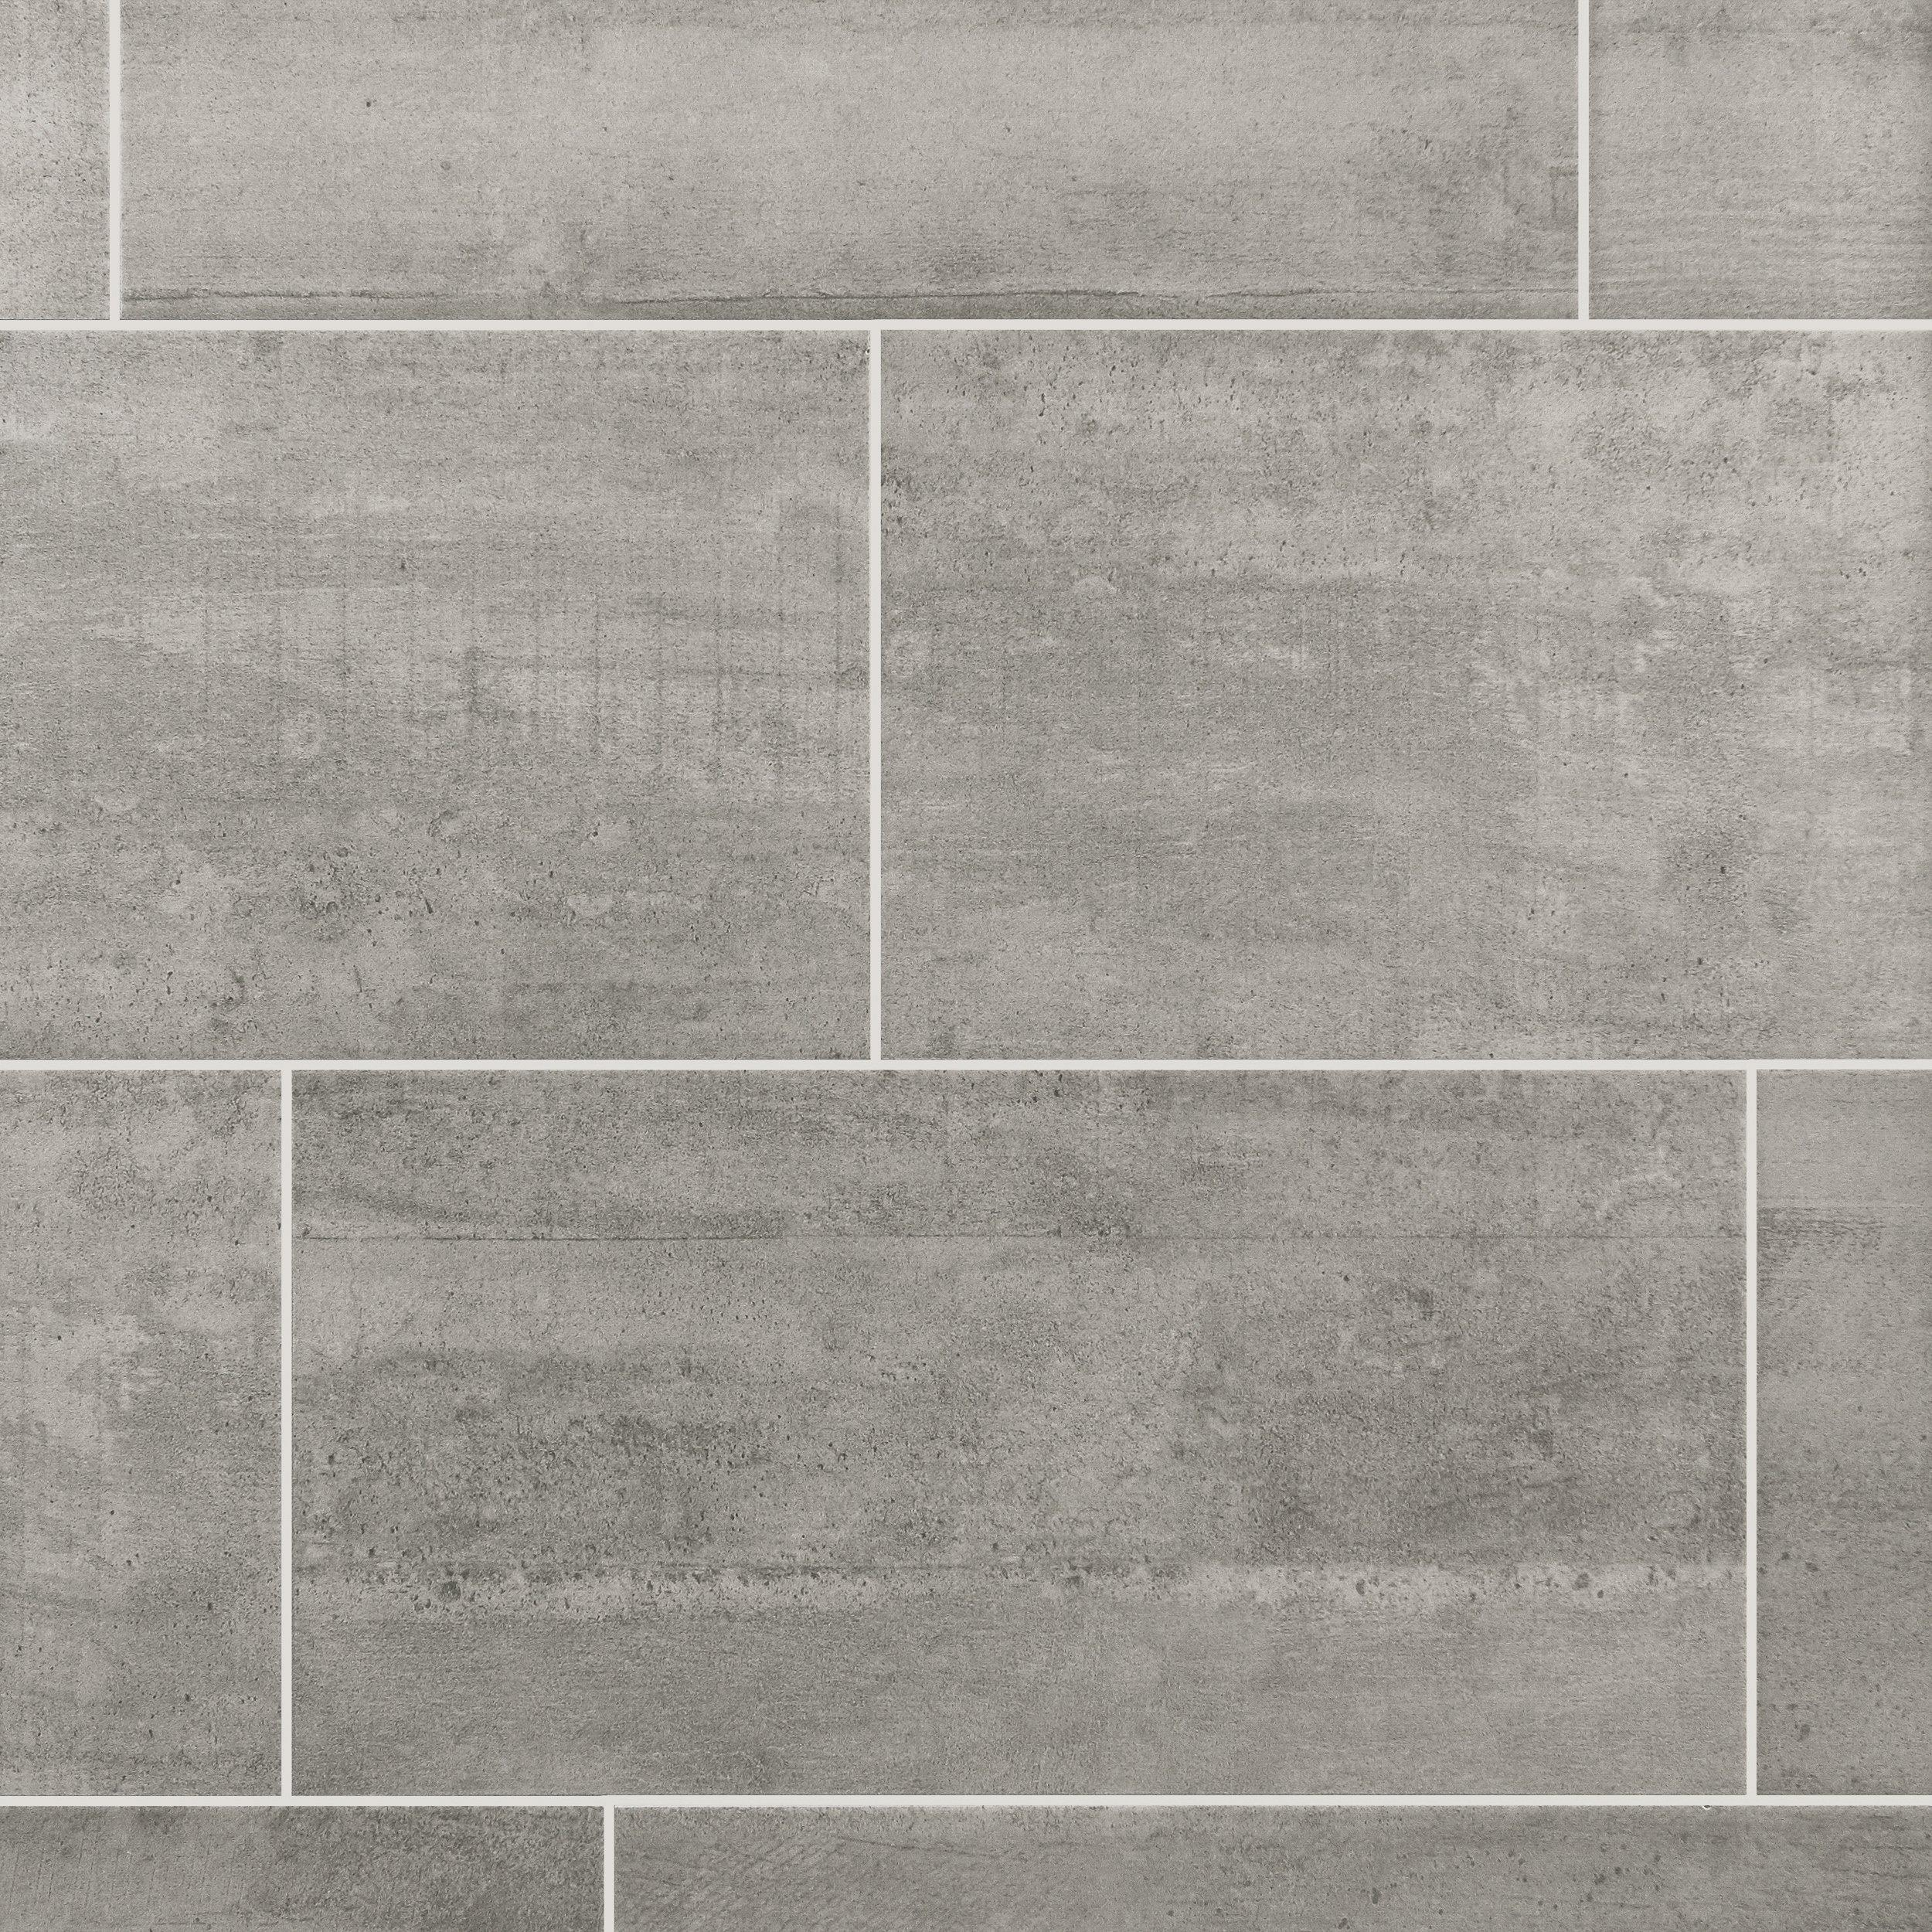 Concrete Gray Ceramic Tile